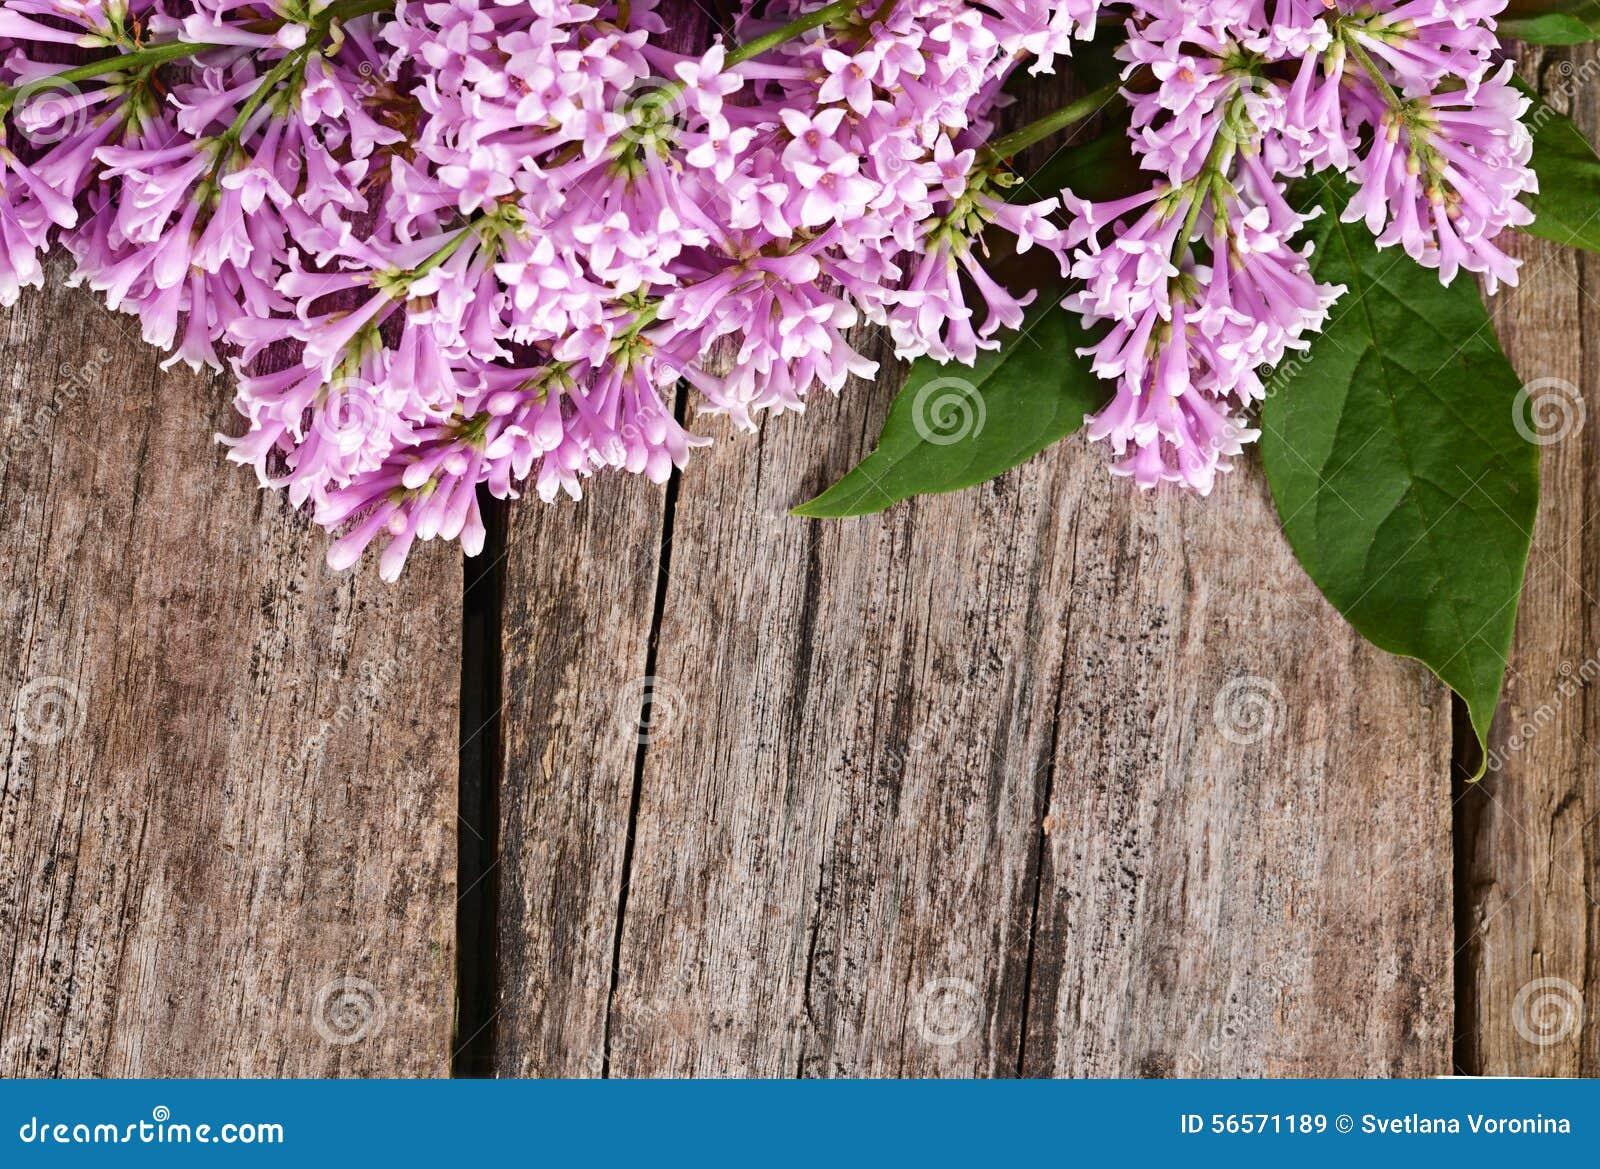 Download Η πασχαλιά λουλουδιών ένα ξύλινο υπόβαθρο Στοκ Εικόνα - εικόνα από phlox, ανθοδεσμών: 56571189